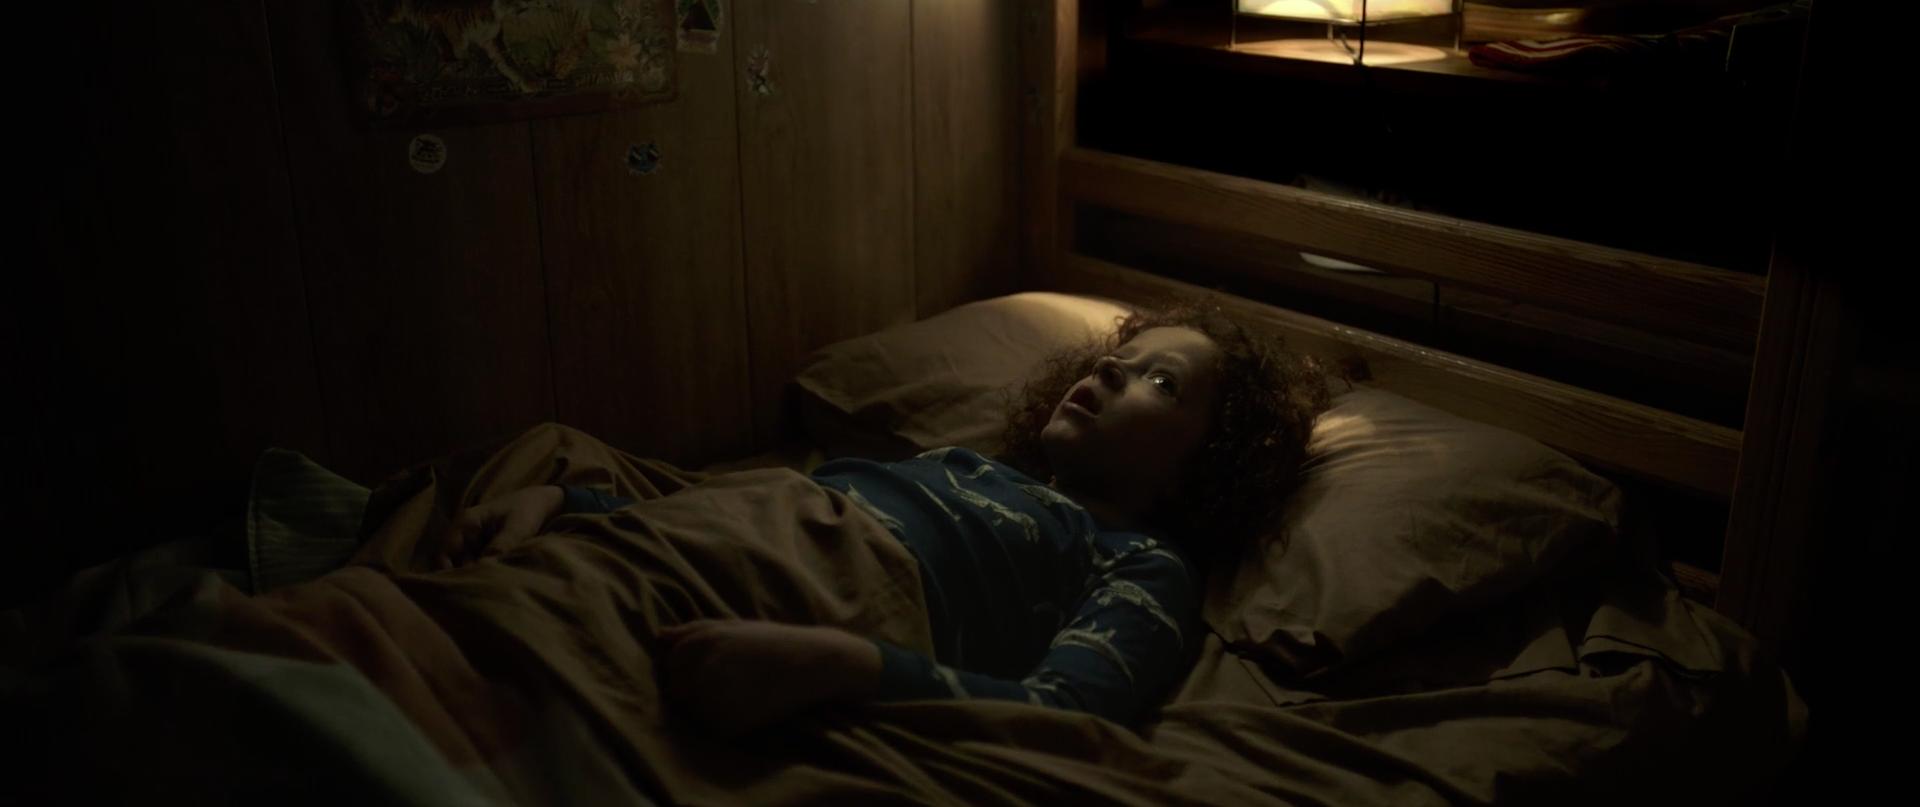 Bedtime Story image film